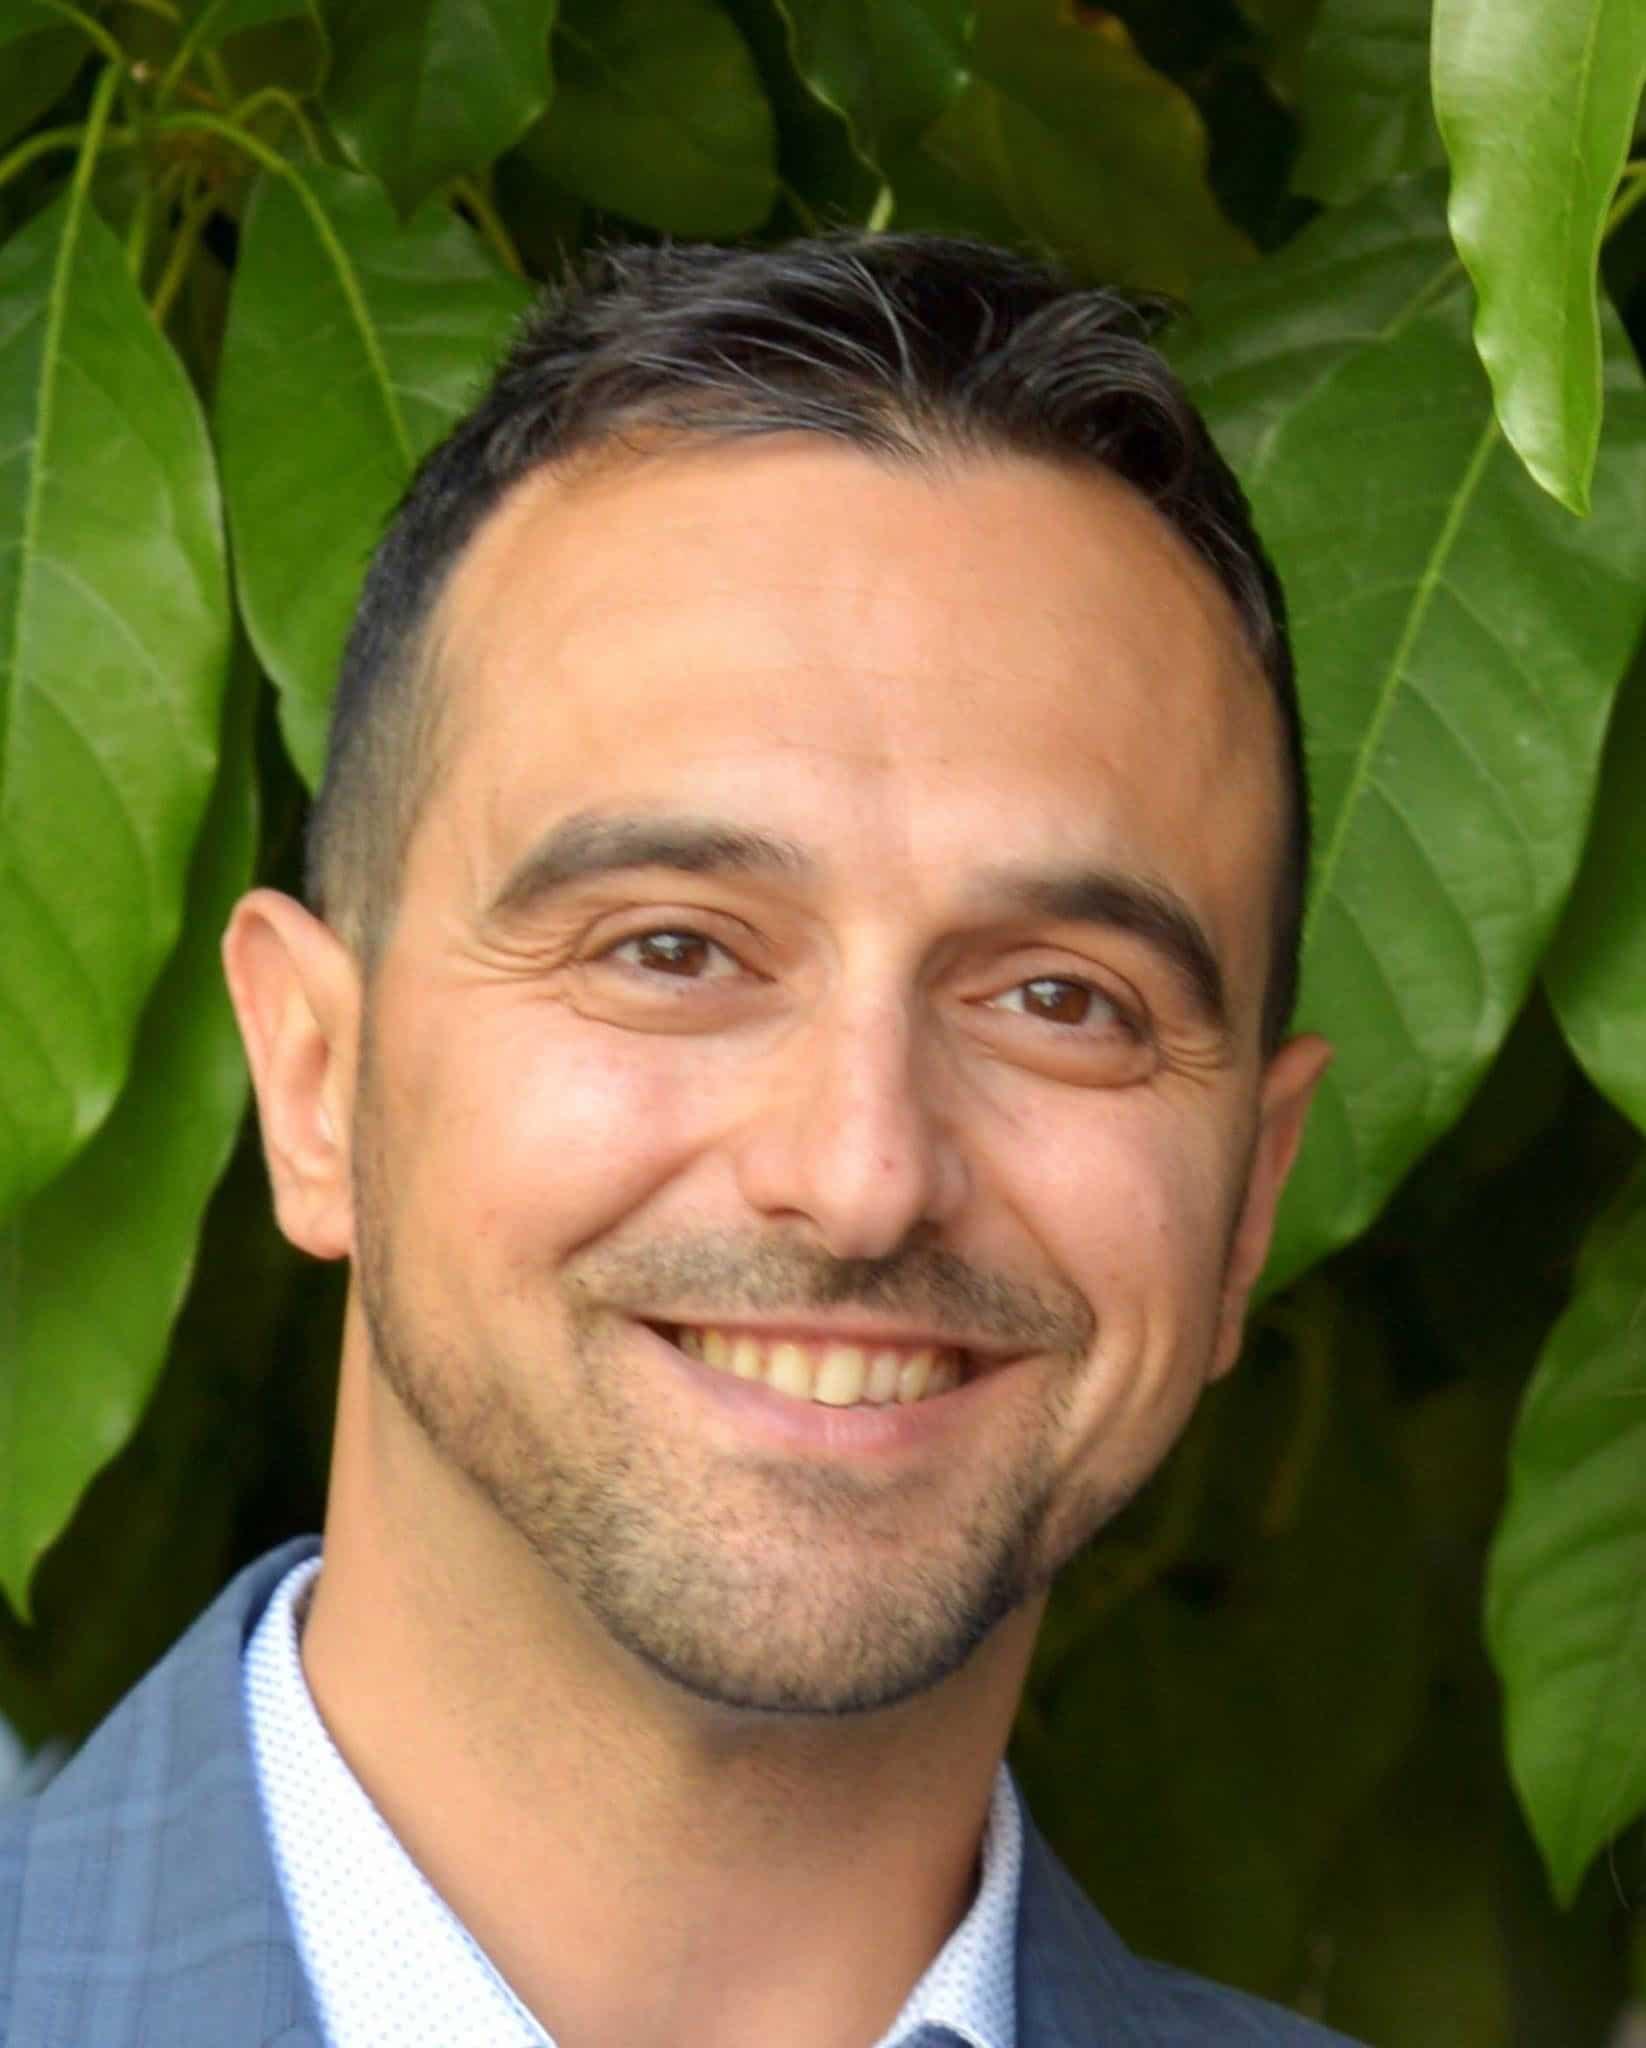 Pasquale Trimarco-